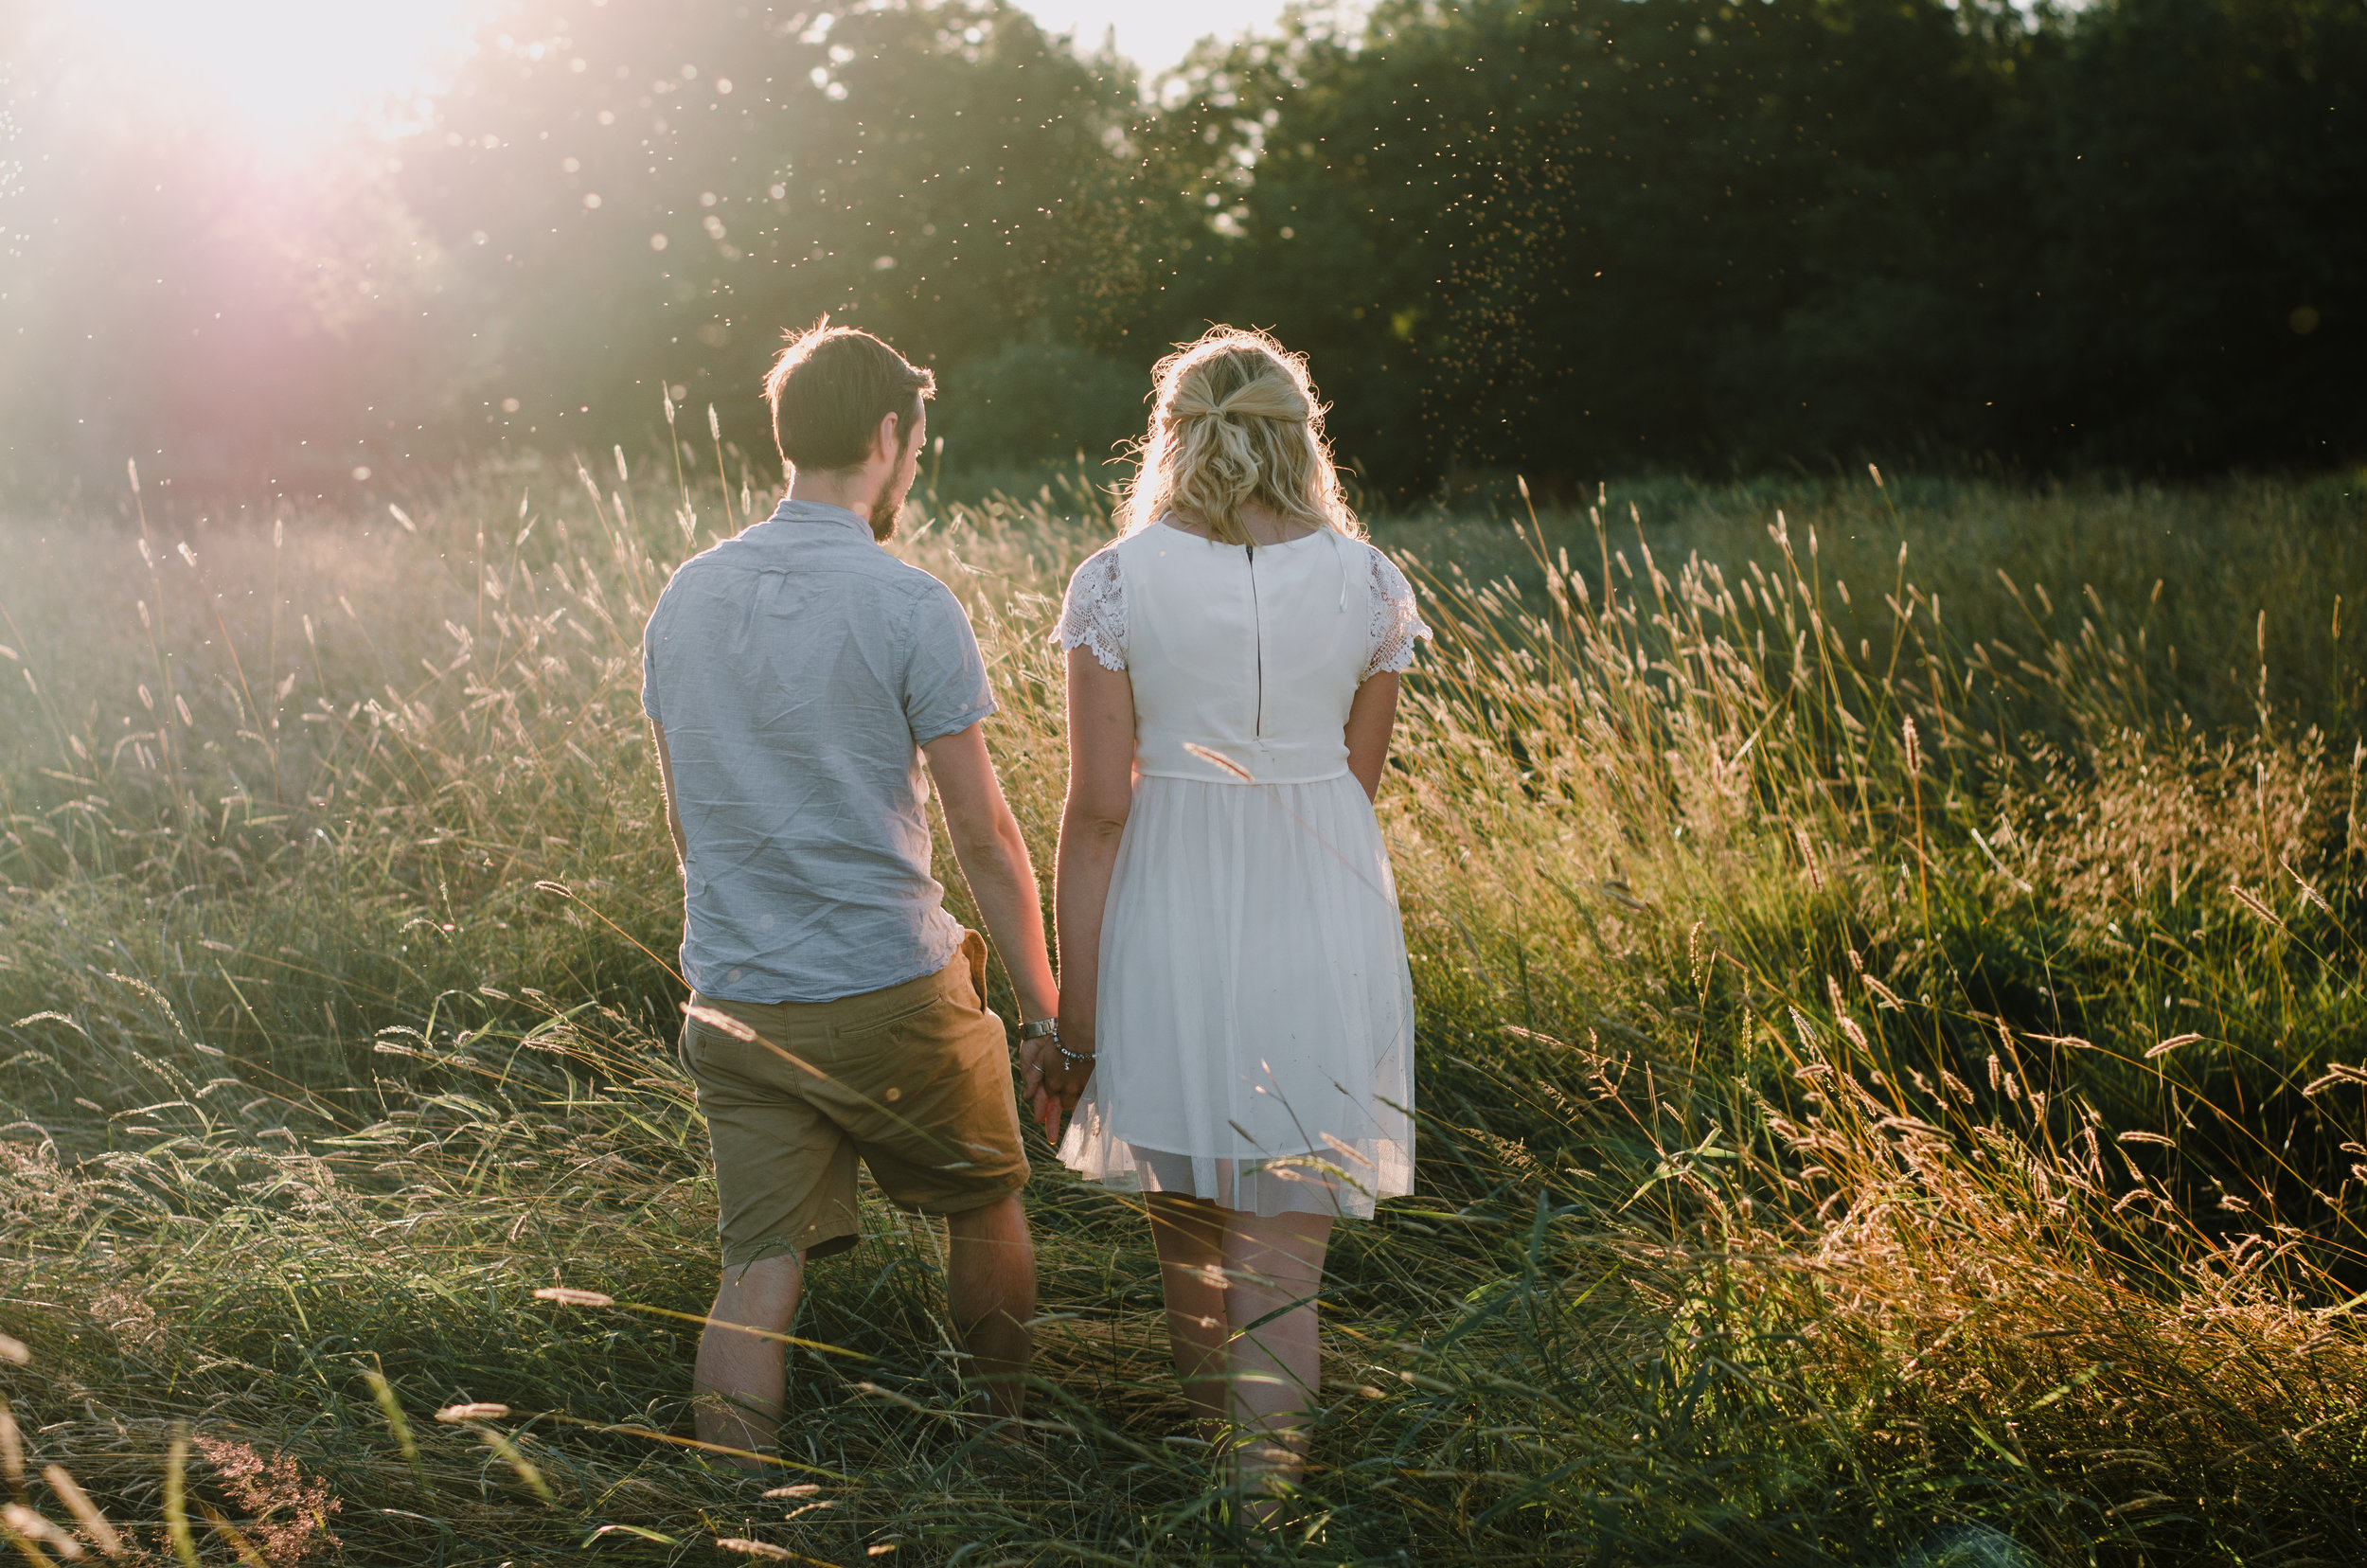 Gina & Chris - Barcombe Mills - Couple Session - Aiste Saulyte Photography-38.jpg